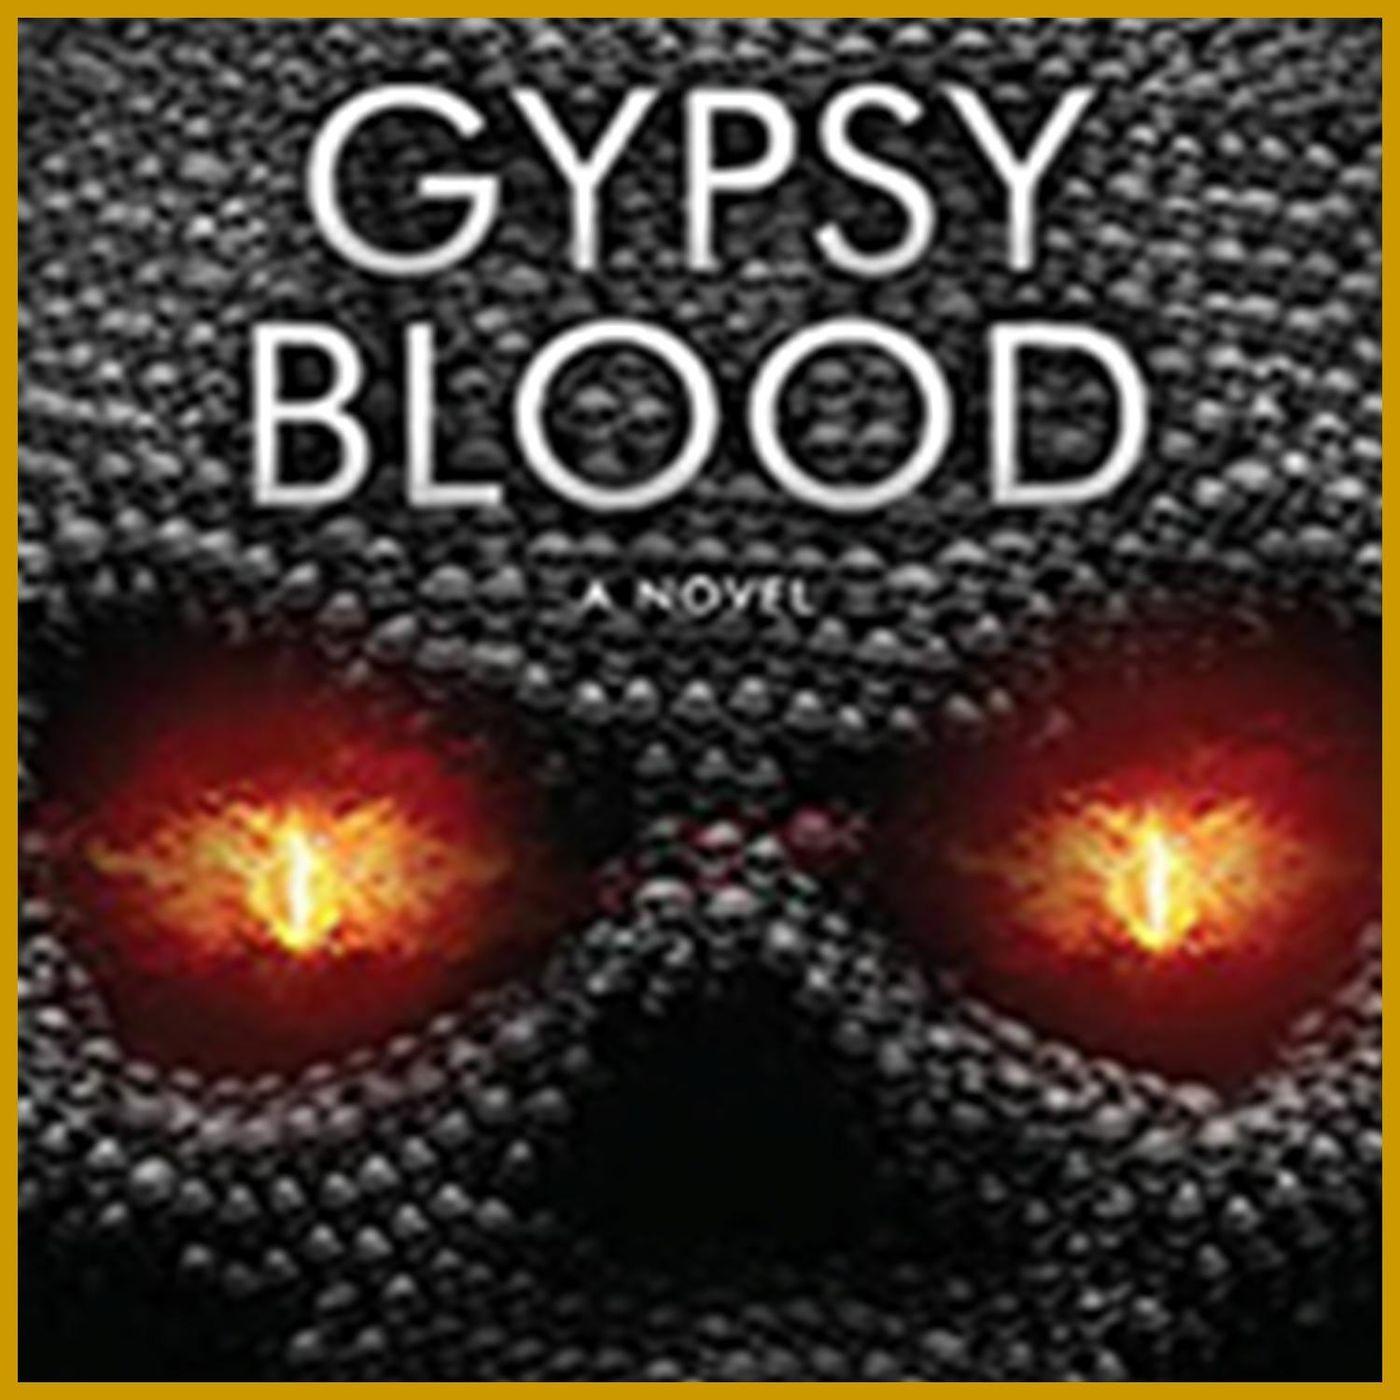 JEFF GUNHUS - Gypsy Blood